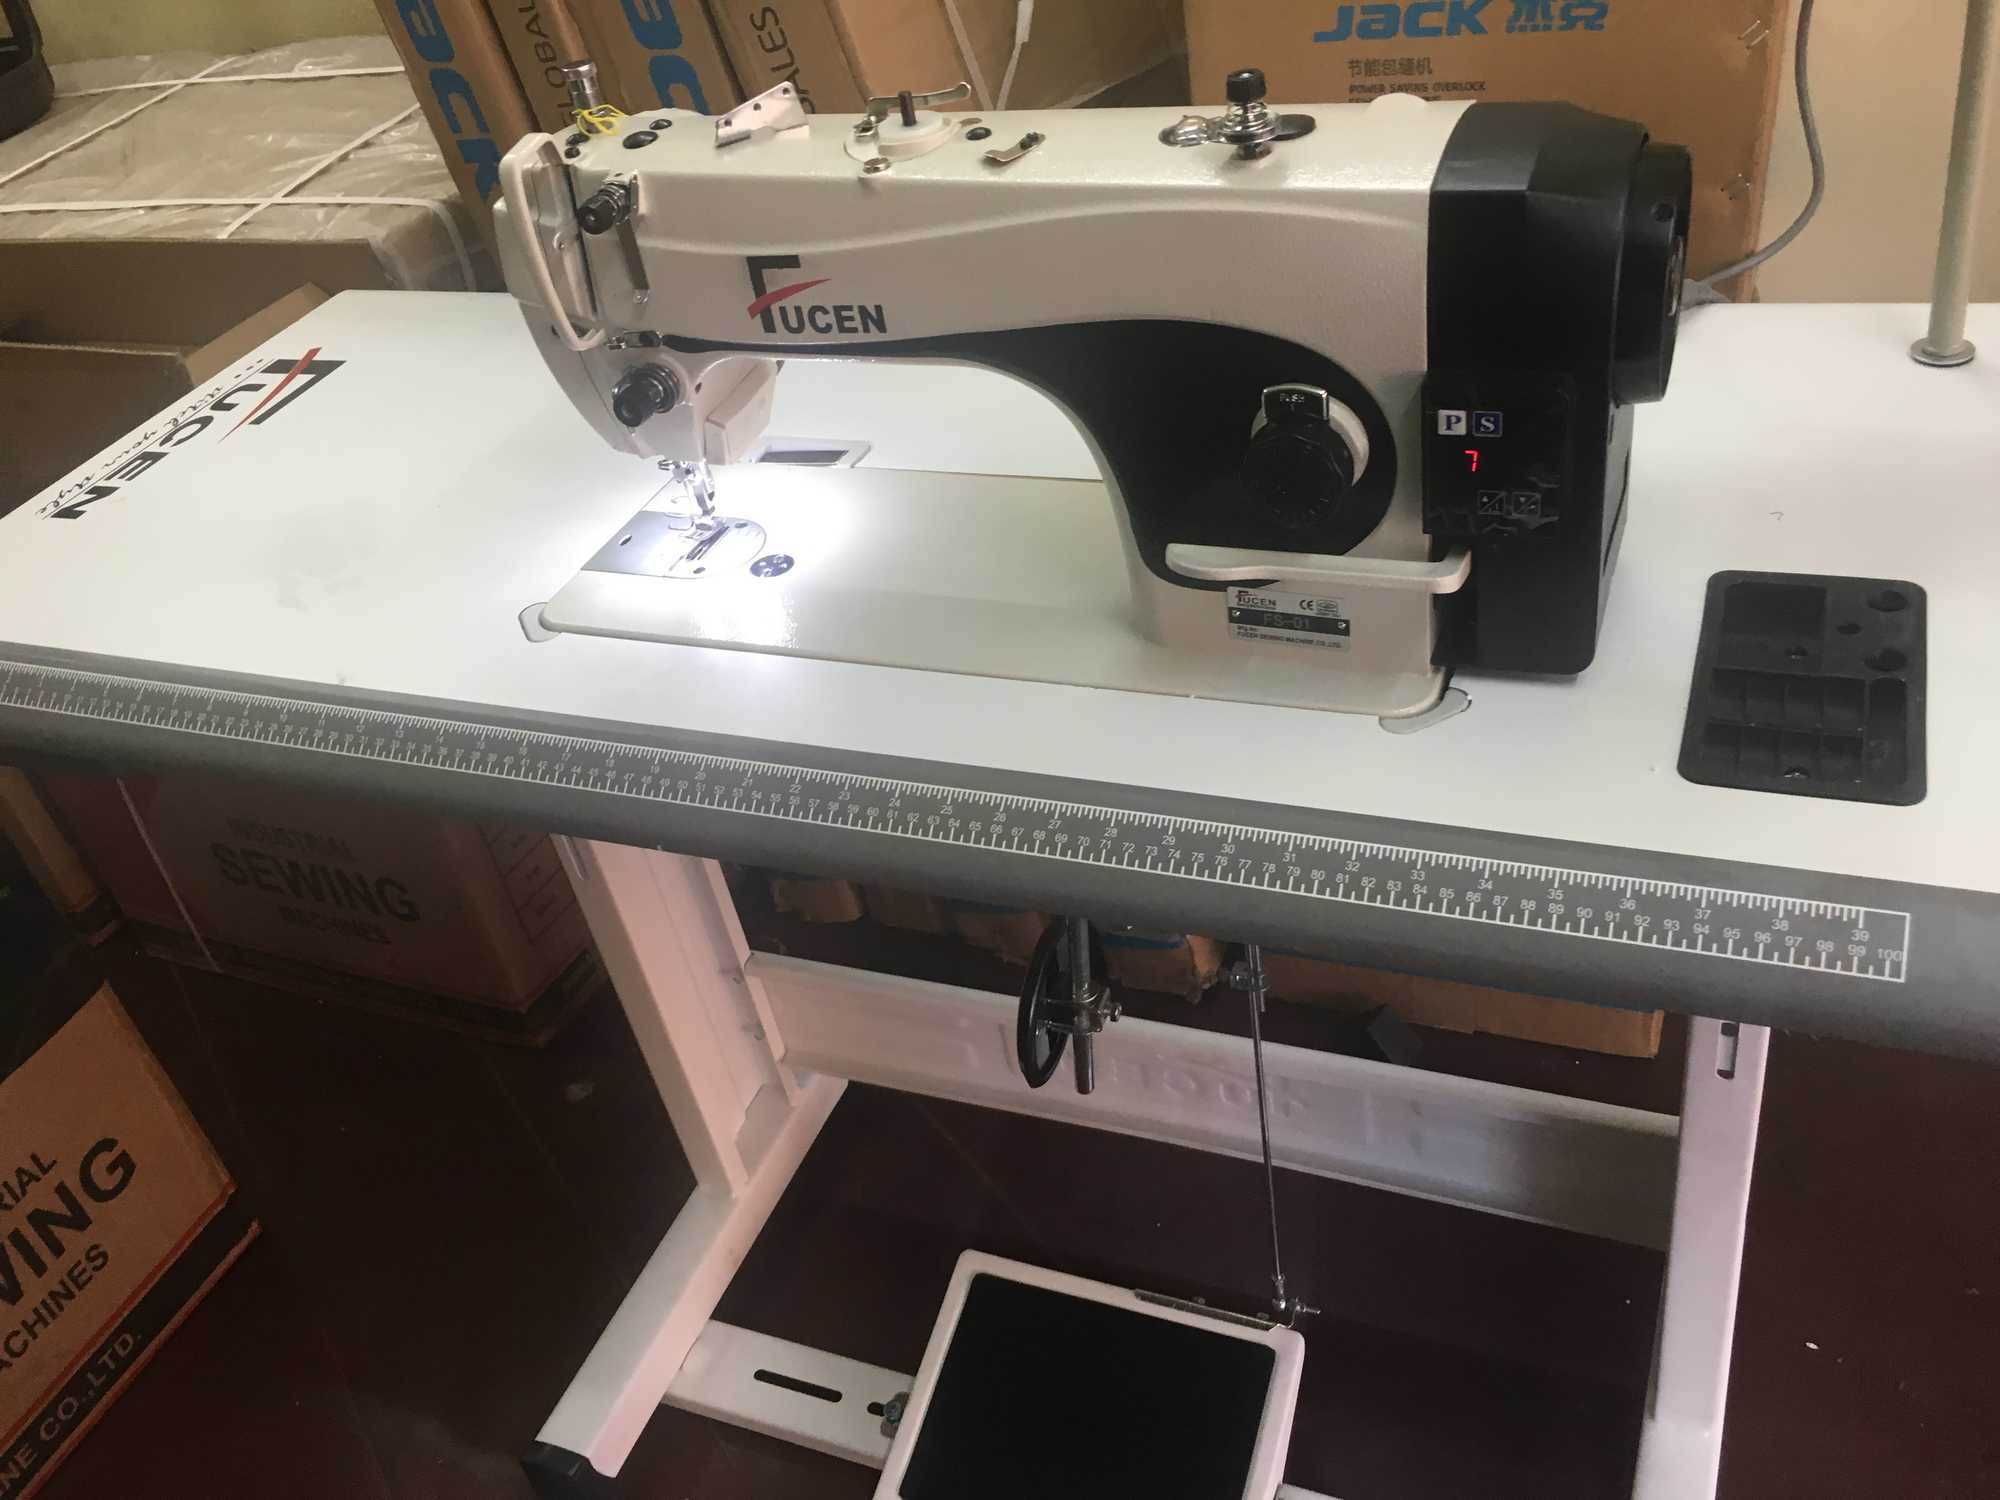 afecd64cb8 Top 20 Juki Sewing Machine Dealers in Coimbatore - Best Juki Sewing ...